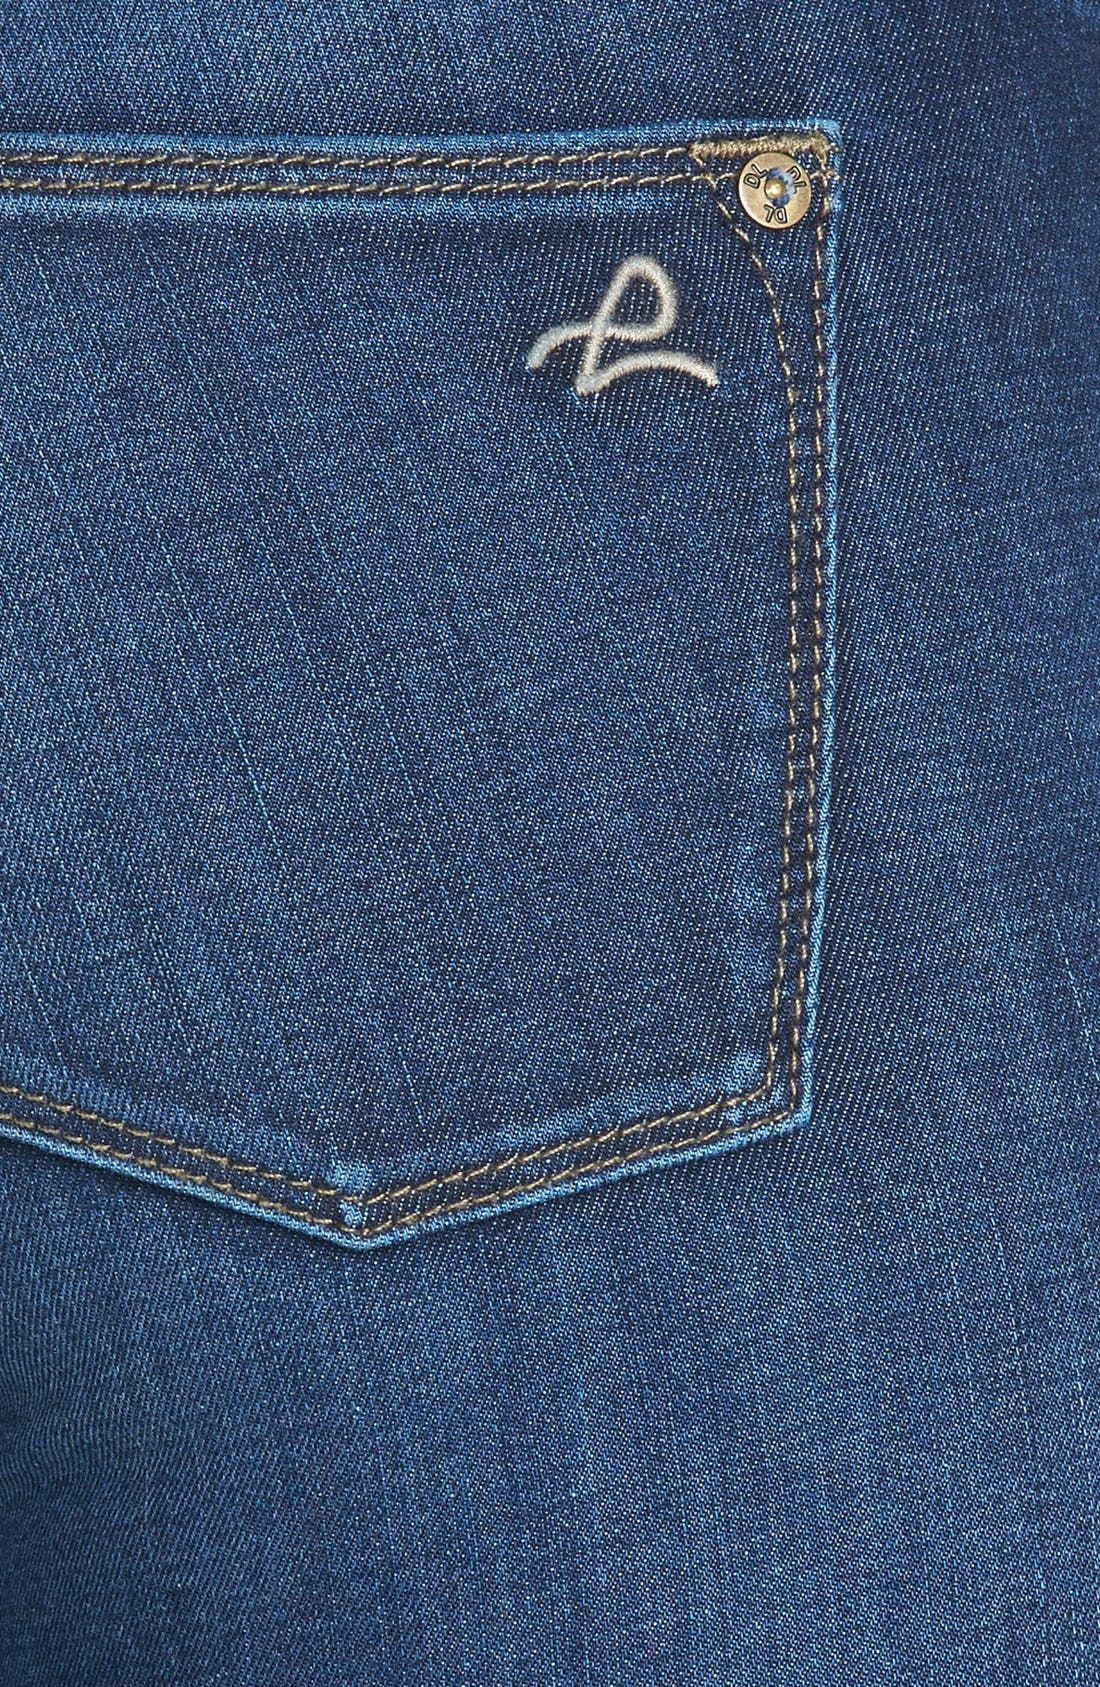 Alternate Image 3  - DL1961 'Angel' Ankle Cigarette Jeans (Wall)